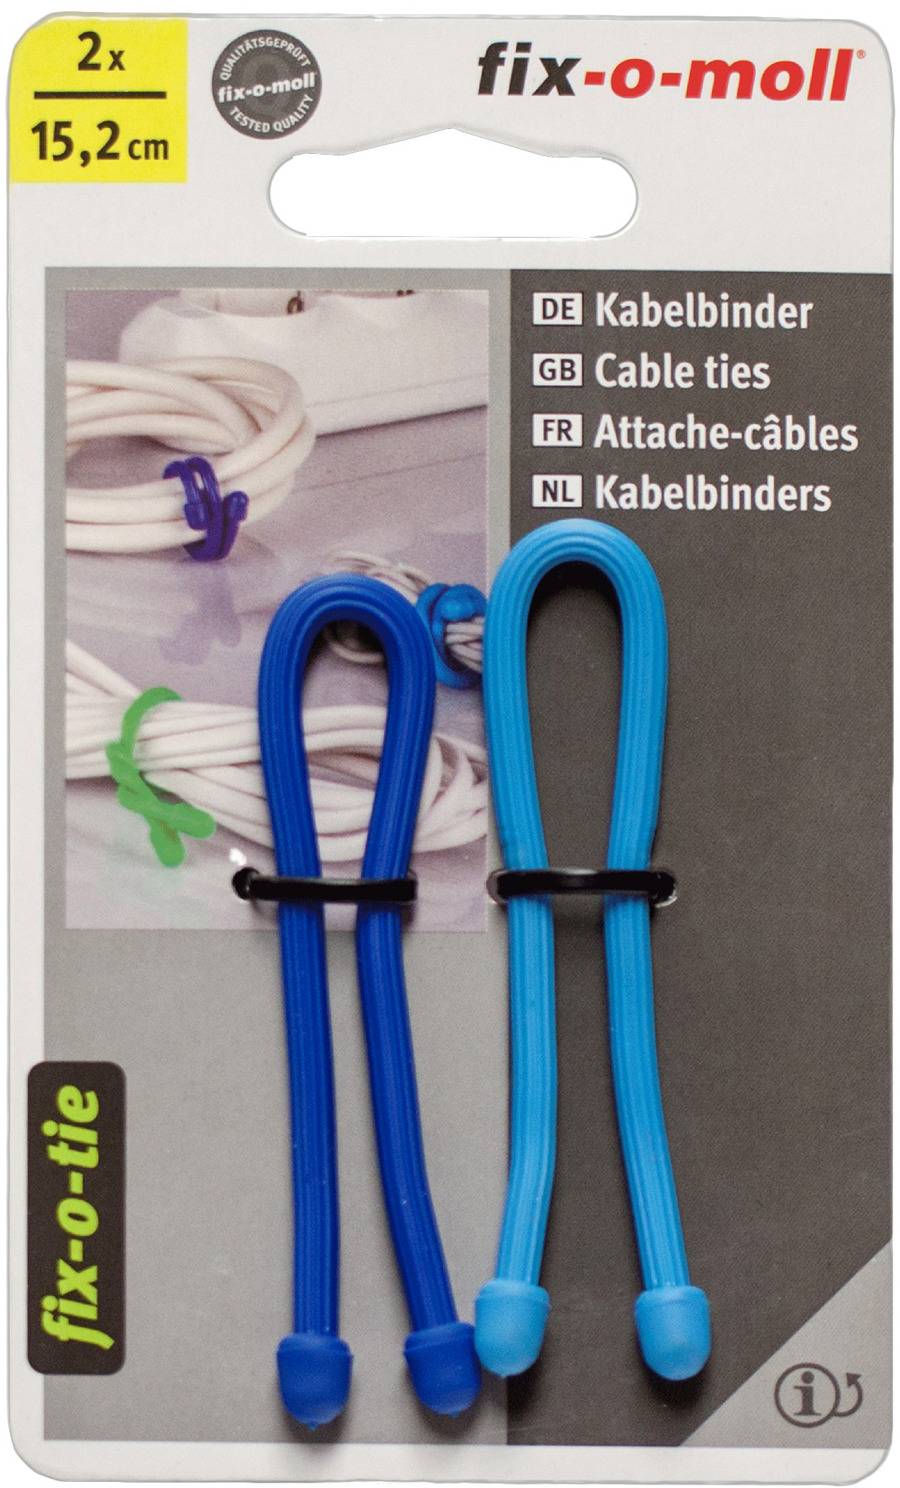 Cтяжка для кабеля Fix-o-moll, 15,2 см, цвет: голубой, синий, 2 шт